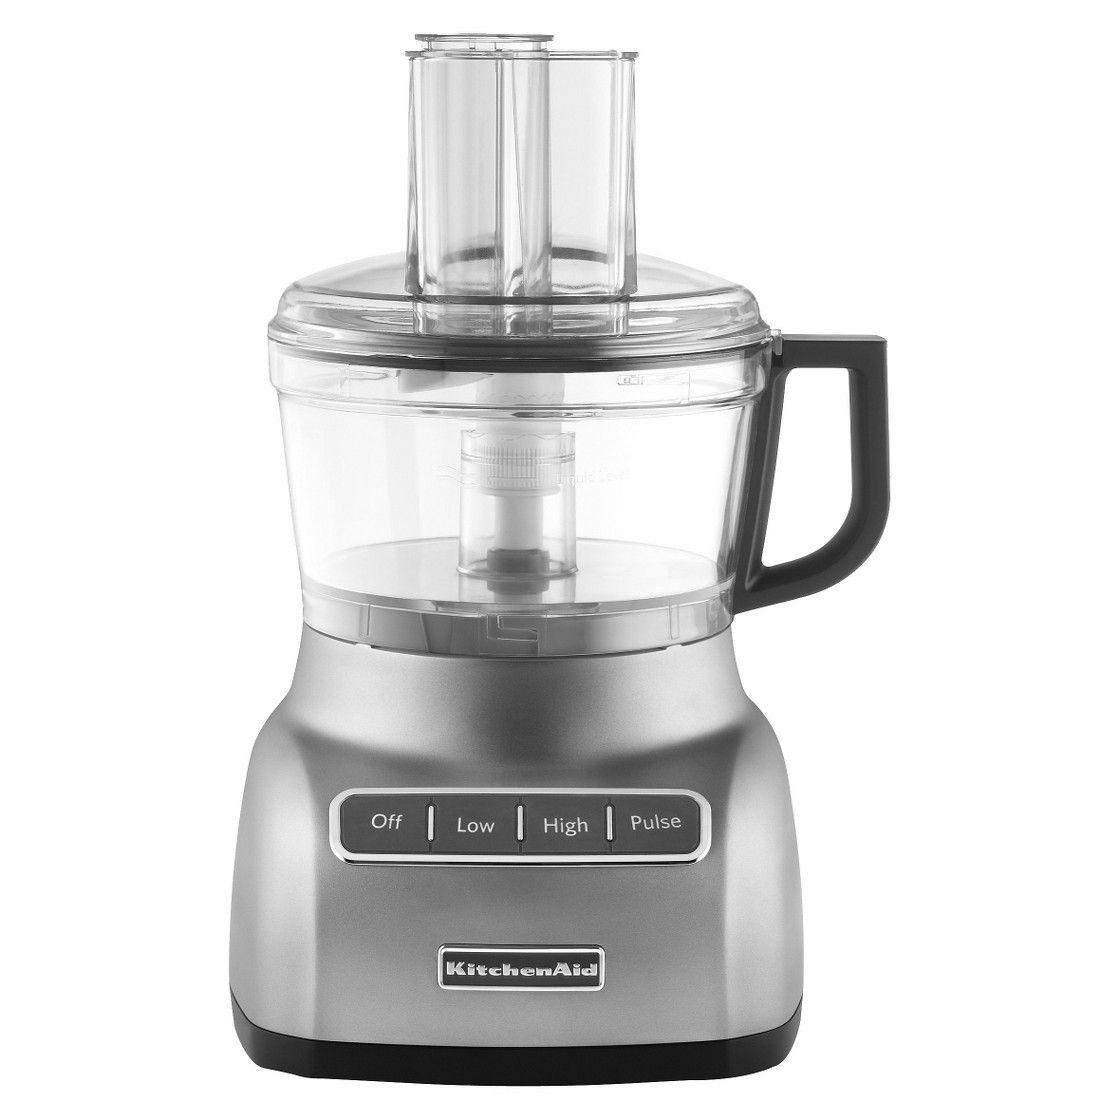 Kitchenaid 7 cup food processor food processor recipes